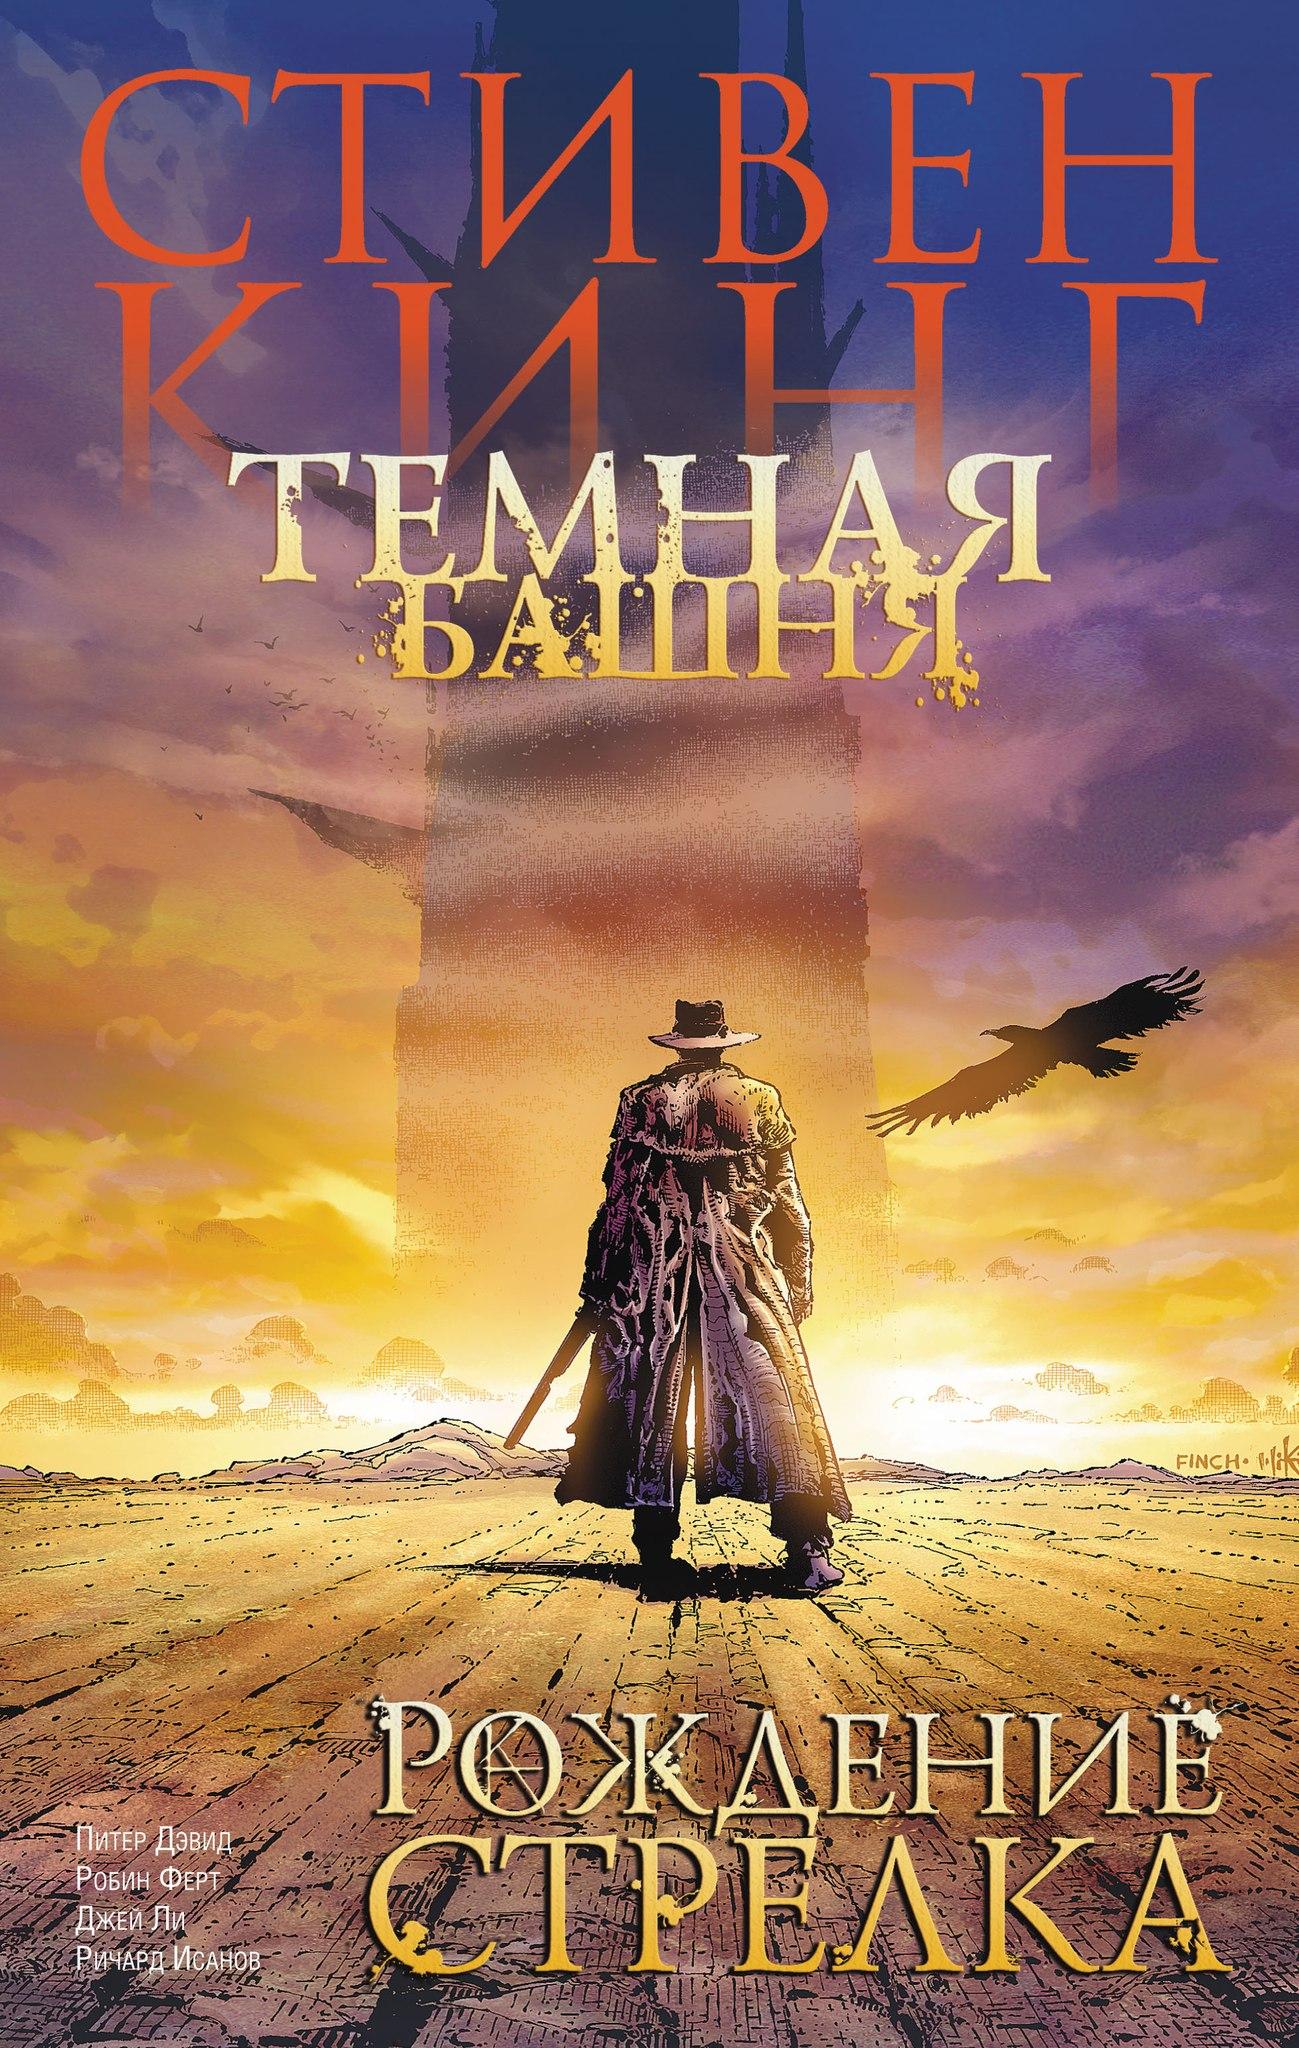 Комикс «Стивен Кинг. Темная башня. Рождение стрелка» (2007)